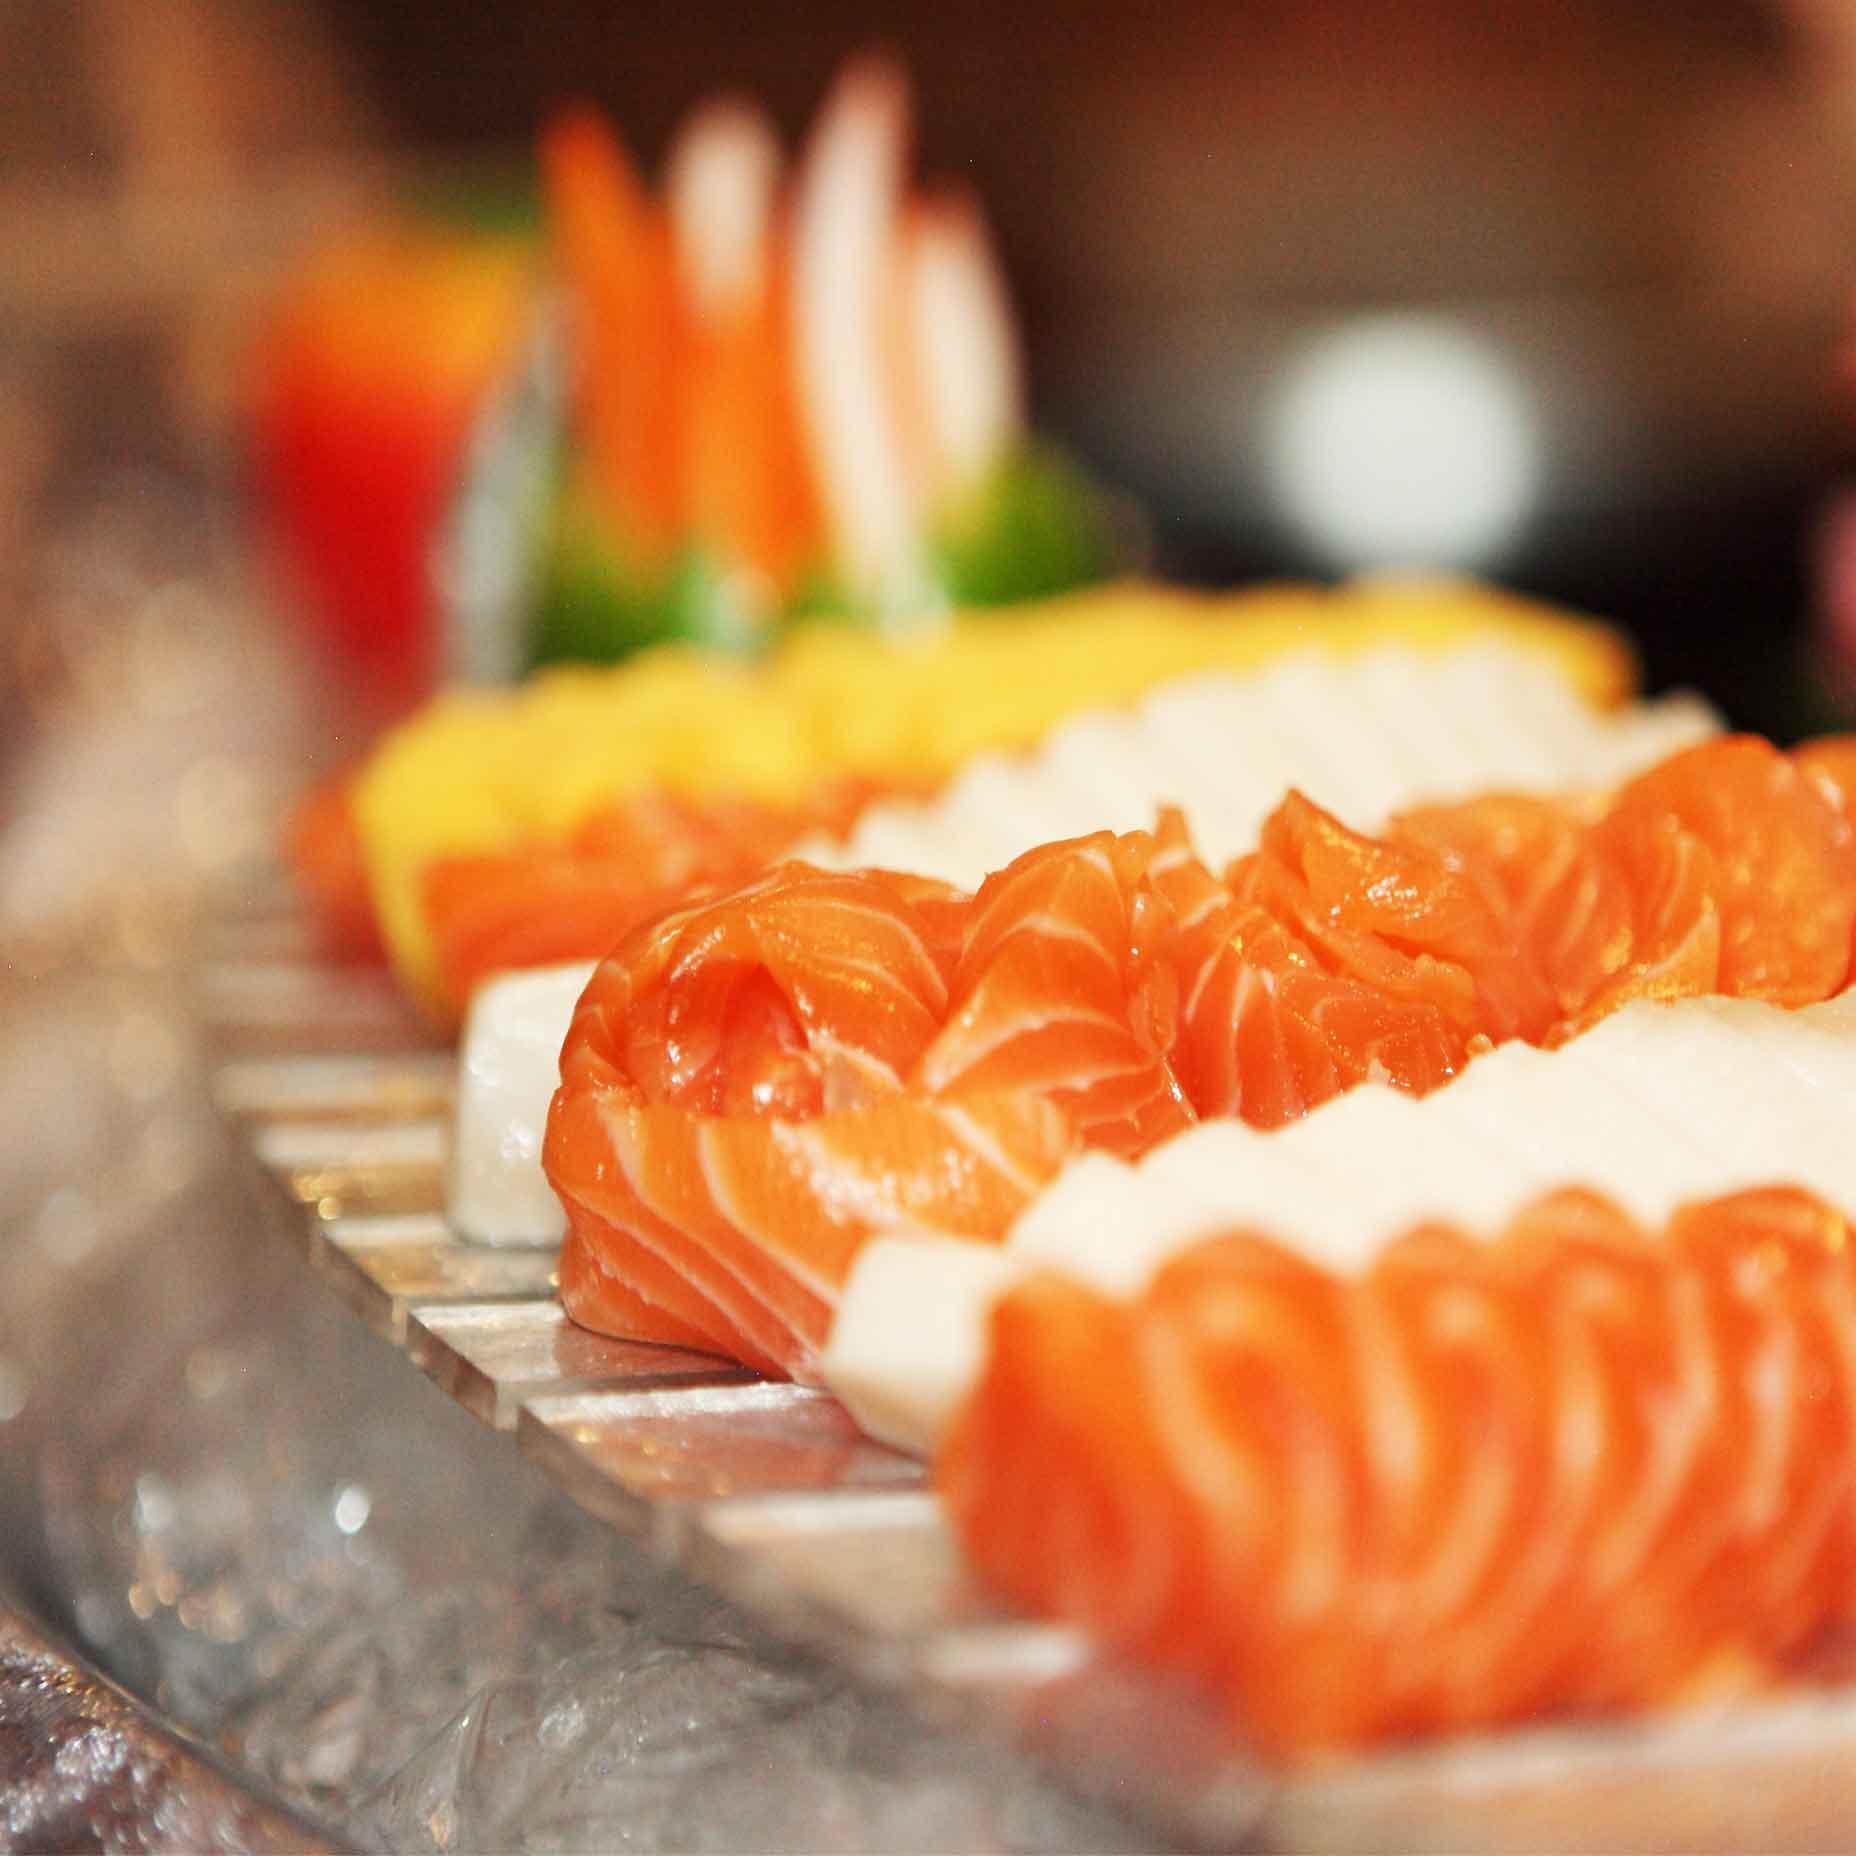 Wok Of Fame - All you can eat buffet in Brampton - Sushi Bar